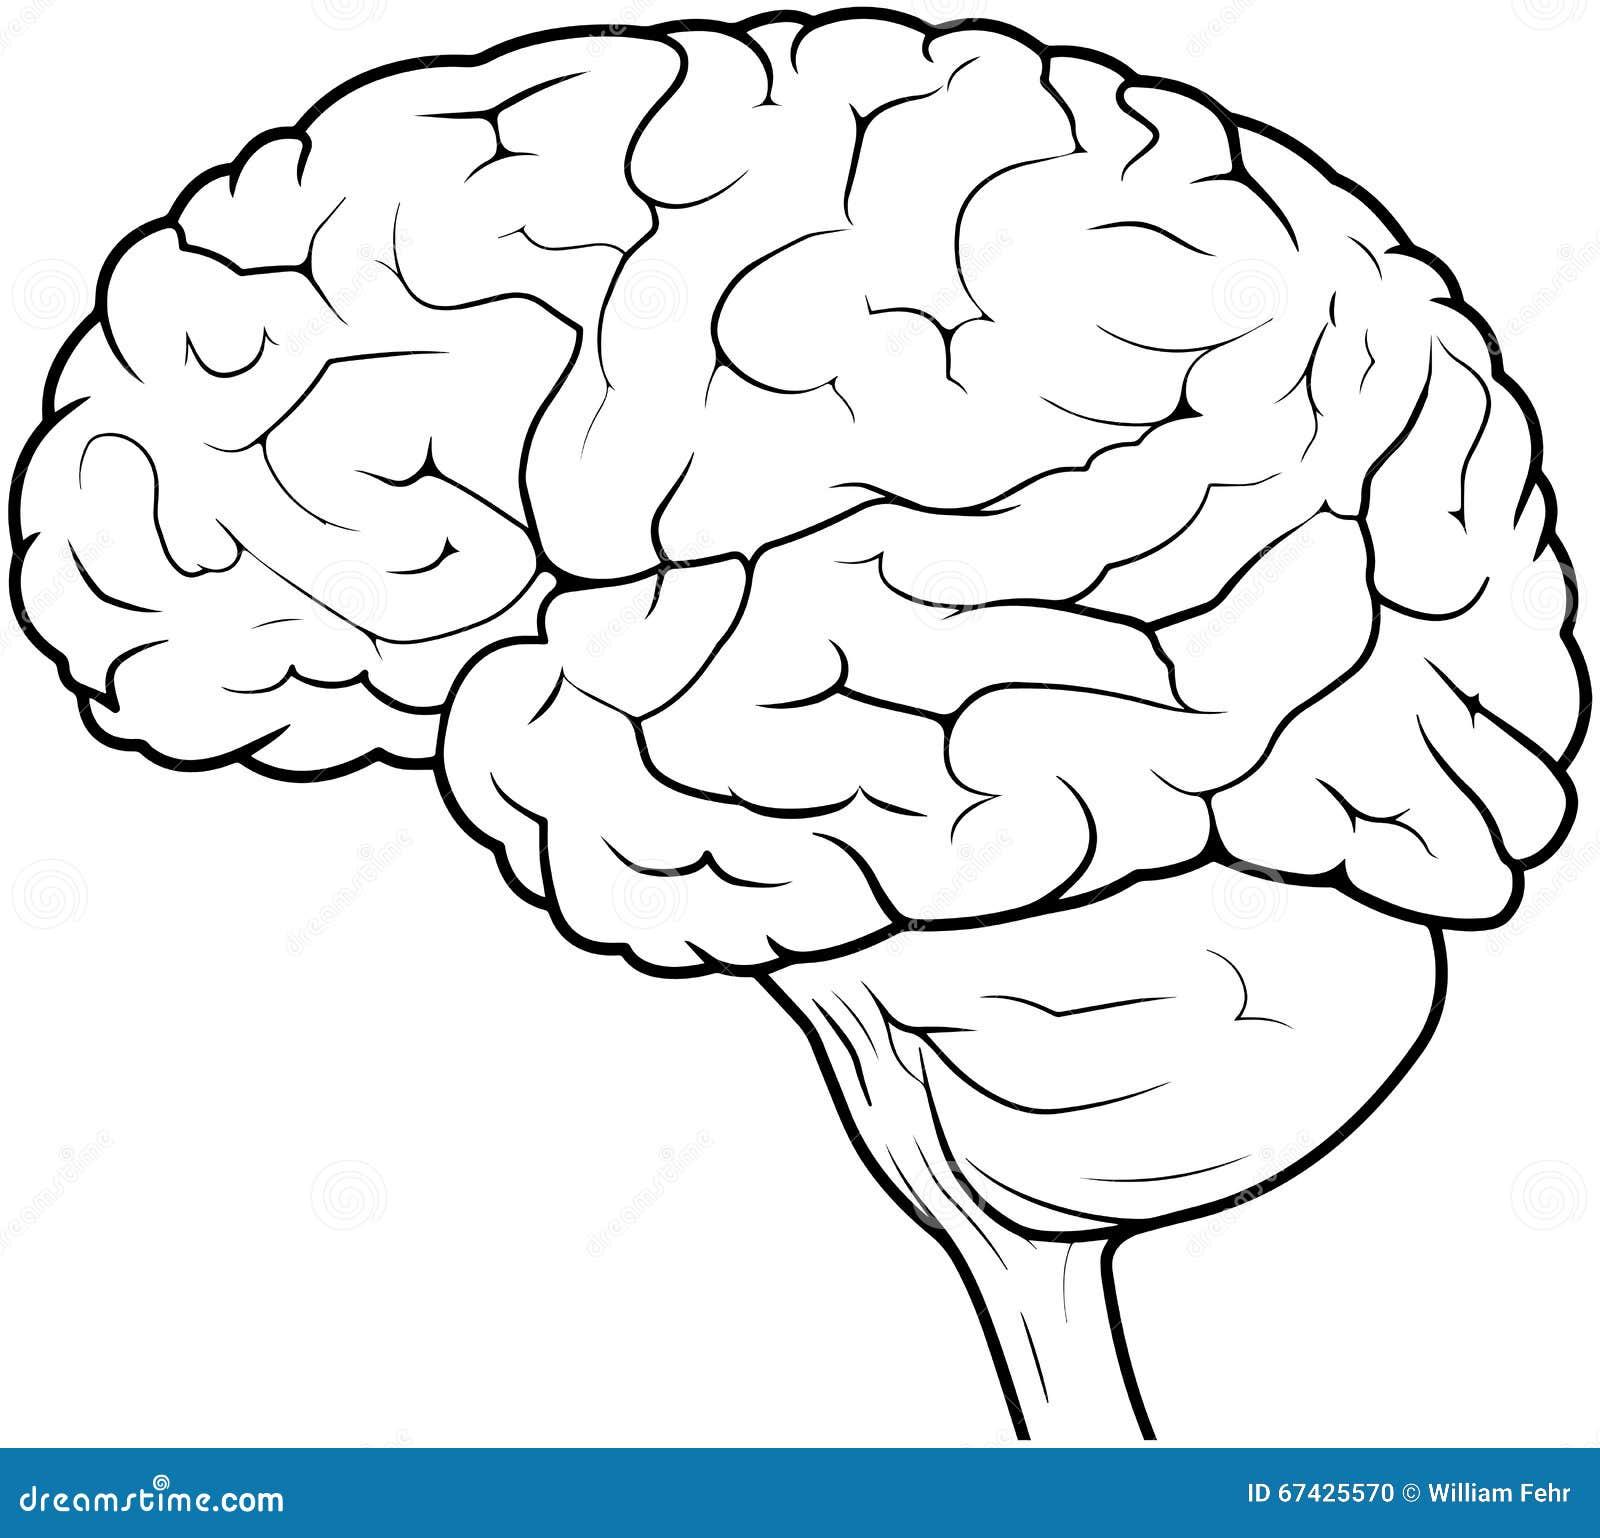 ser humano brain drawing ilustra u00e7 u00e3o stock  ilustra u00e7 u00e3o de